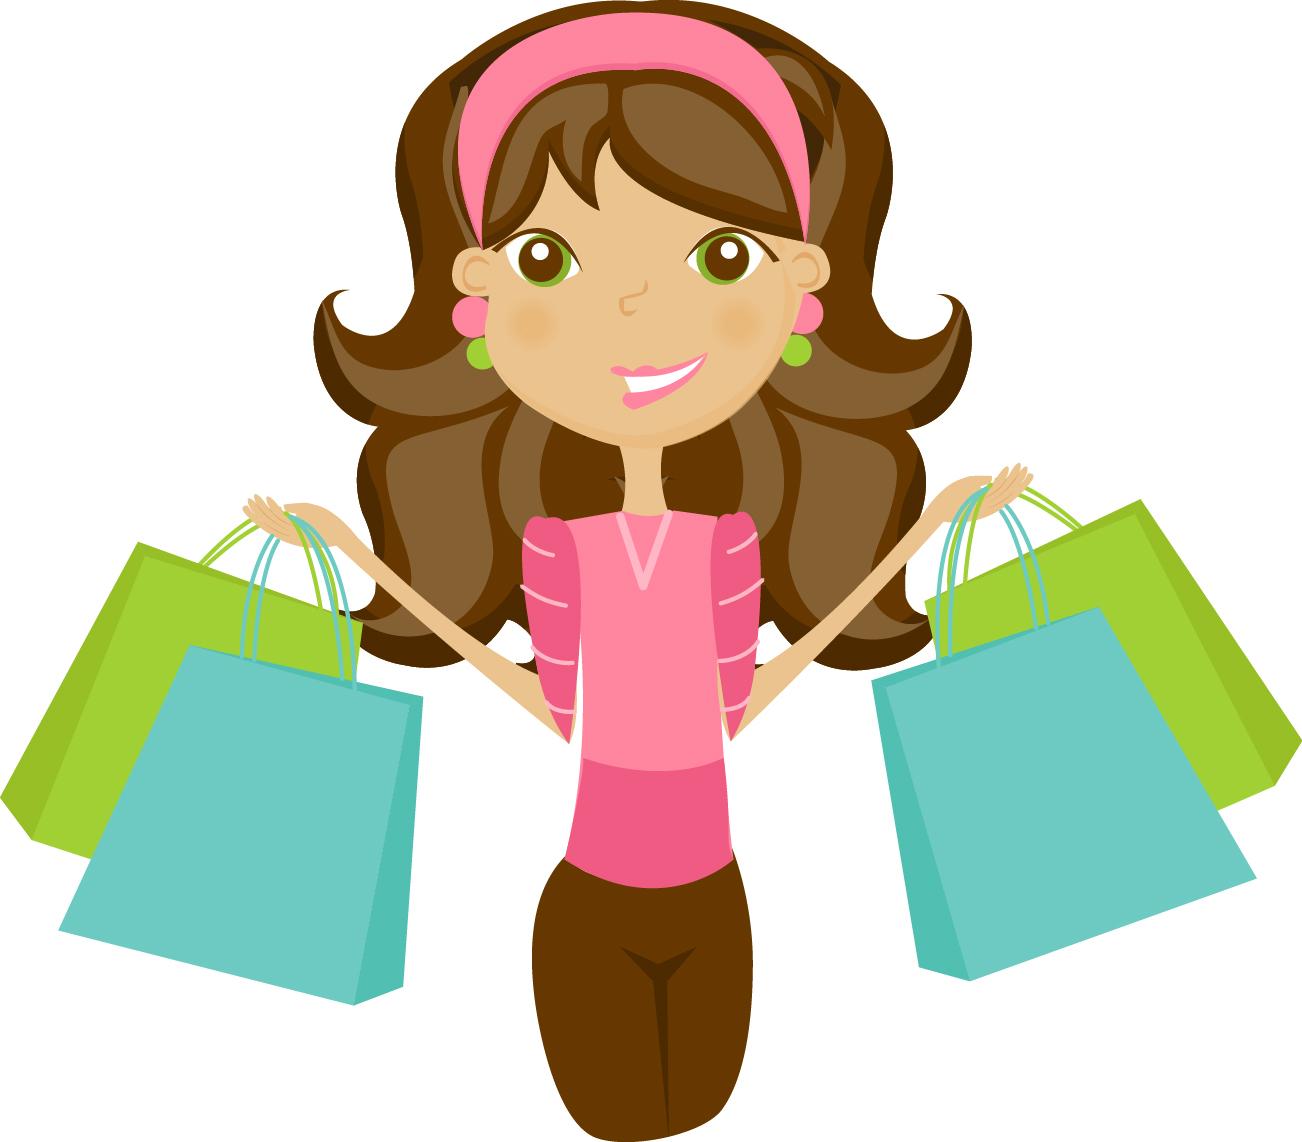 Free clothes shop cliparts. Mall clipart personal shopper